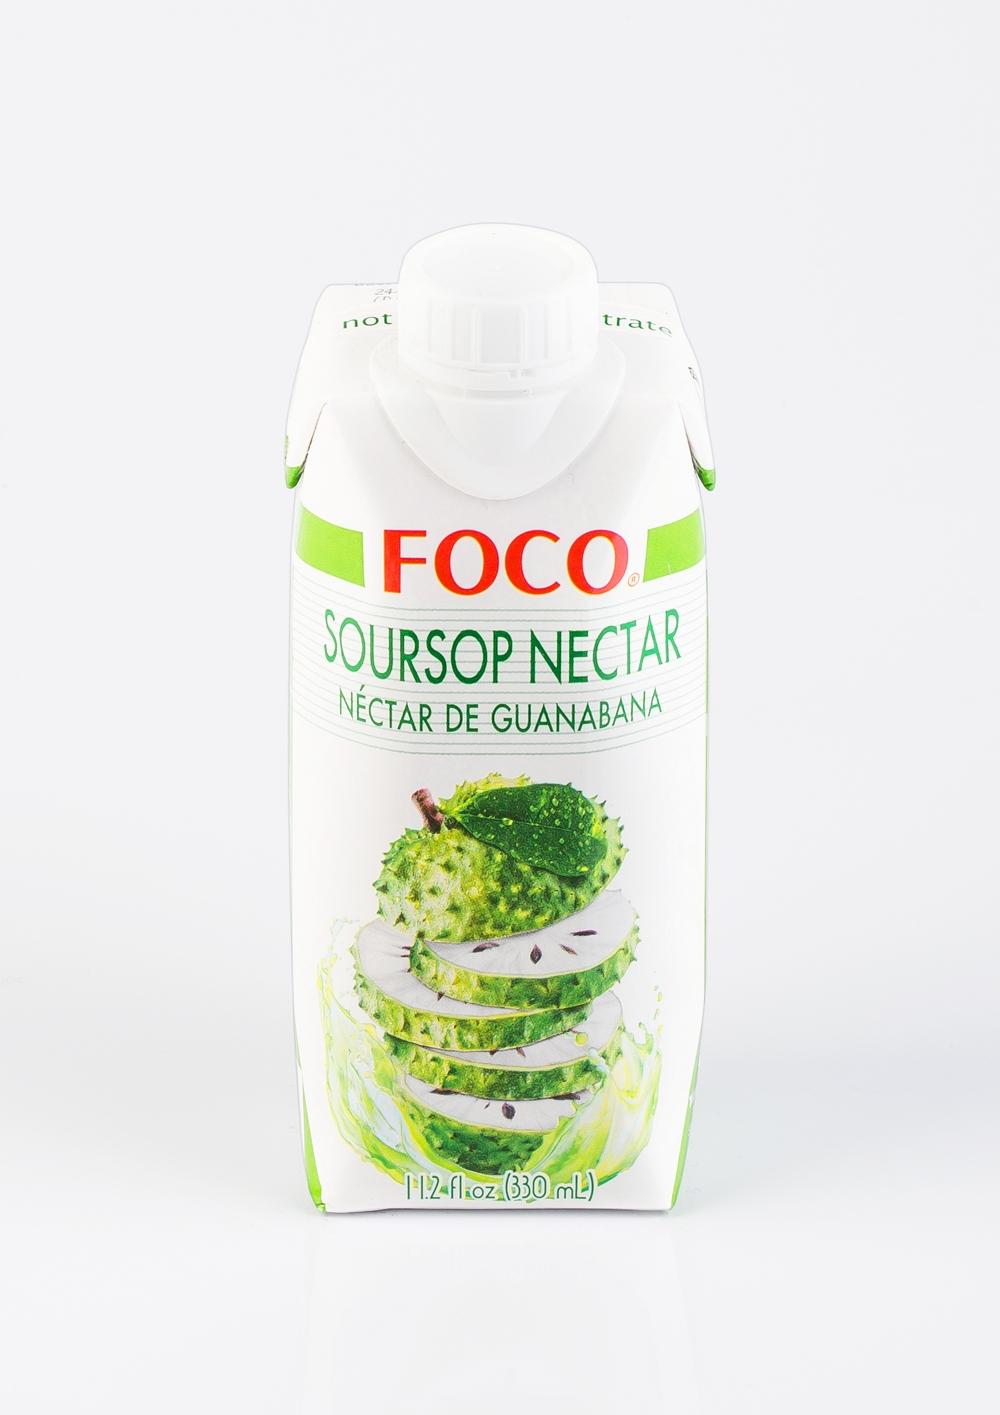 Нектар гуанабаны Foco